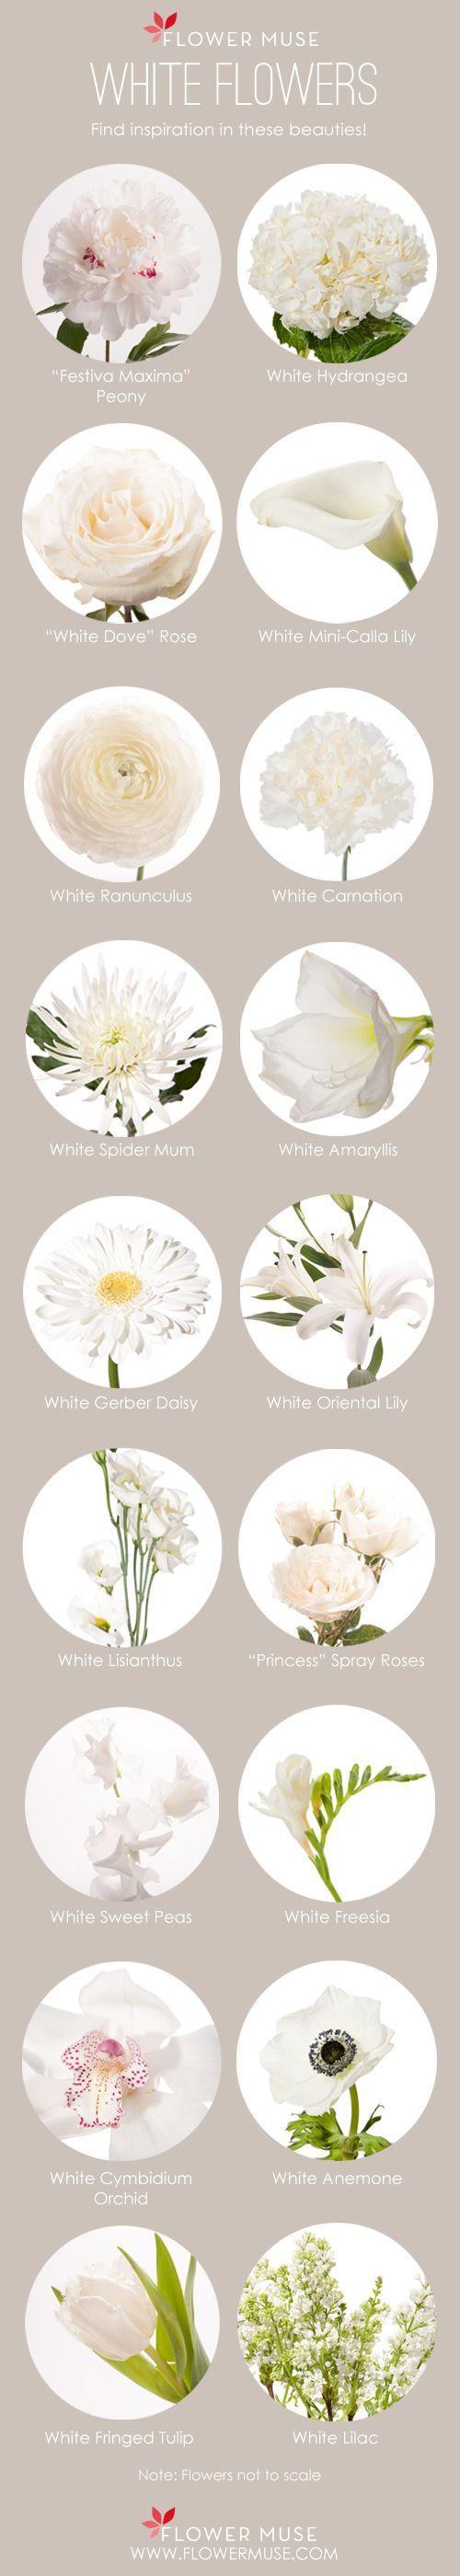 14 amazing white wedding bouquet photos you will love white 14 amazing white wedding bouquet photos you will love awhitewedding mightylinksfo